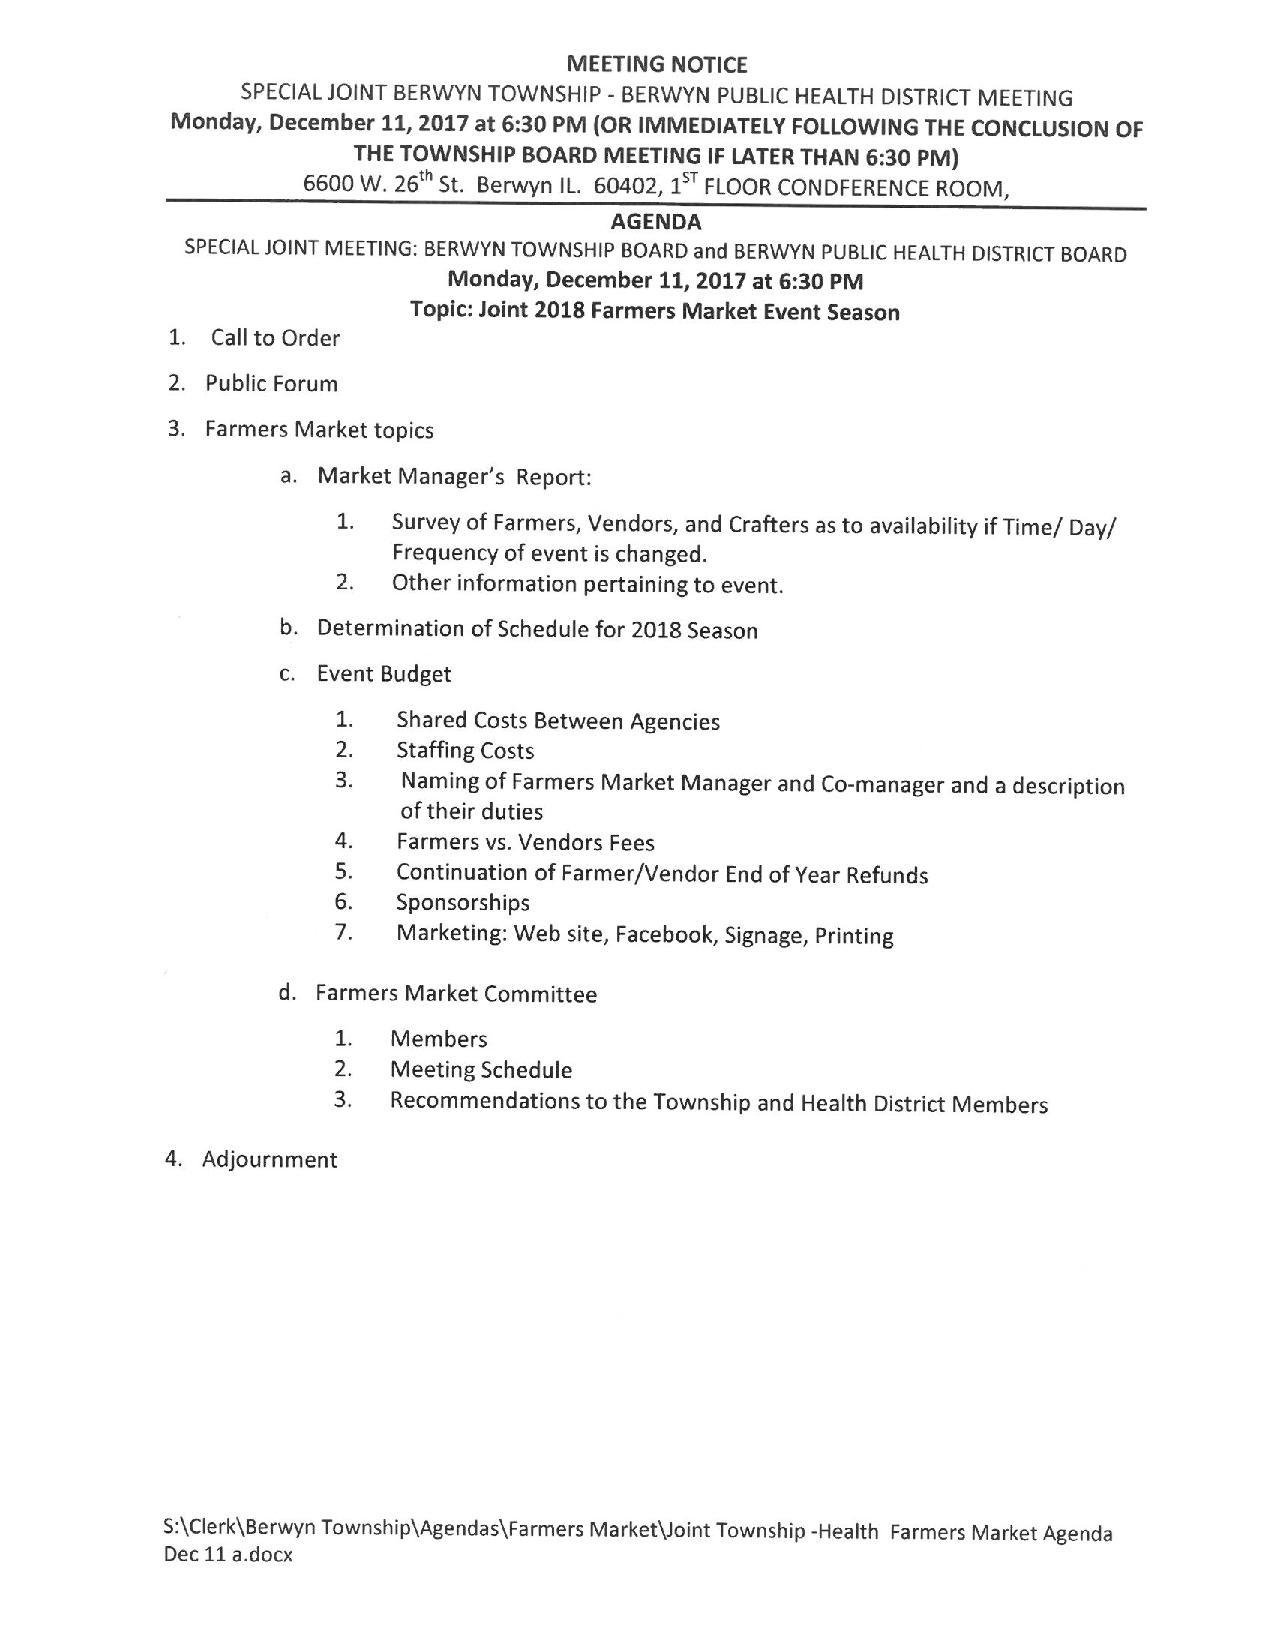 FM_Agenda_12.11.2017-page-001.jpg